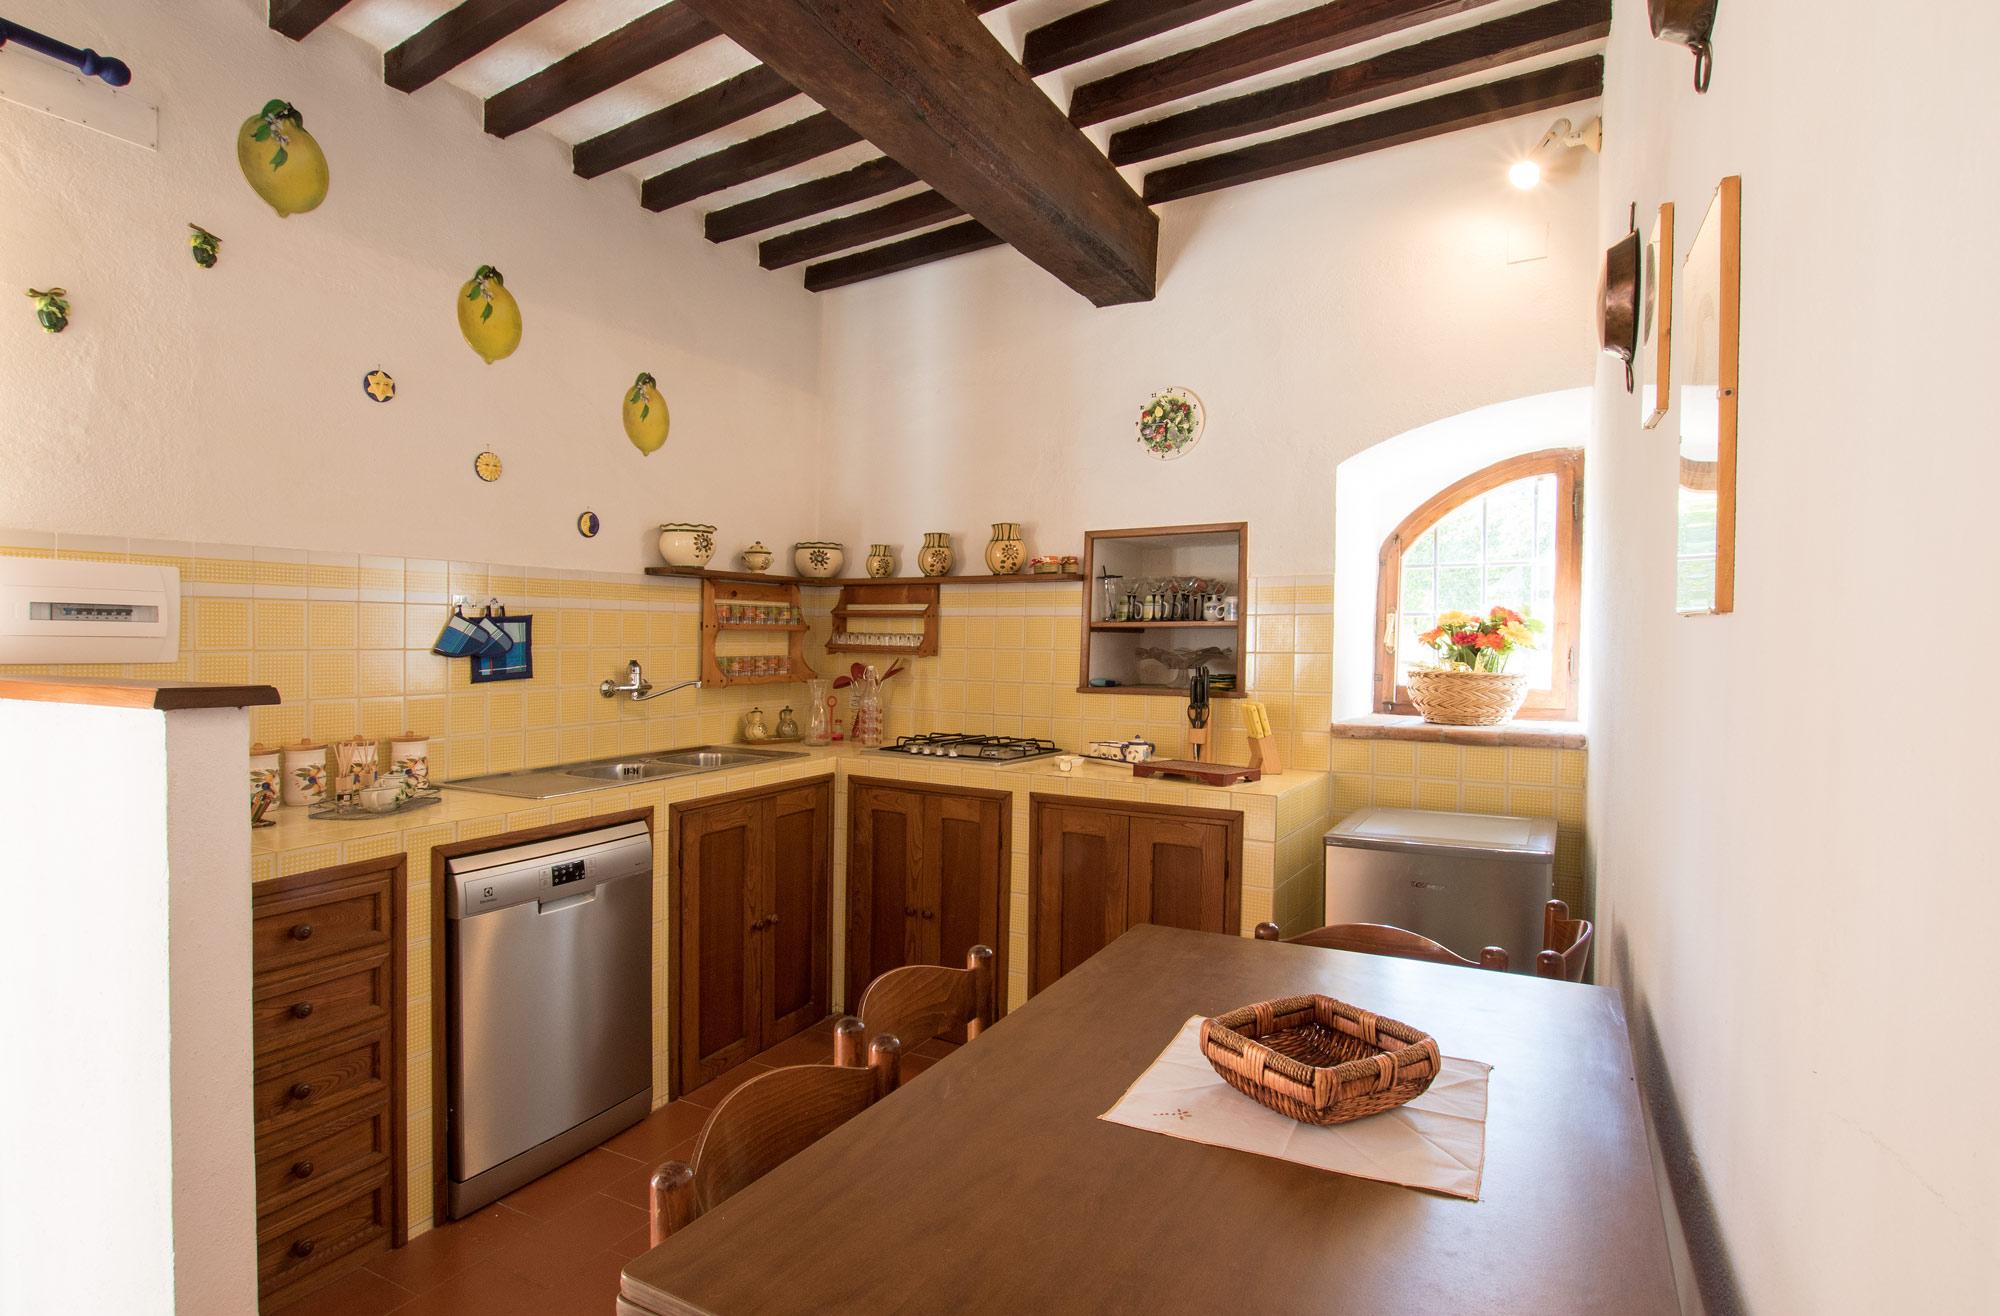 antica-villa-degli-ulivi-cortona-luxury-room-rentals-tuscany-holiday ...